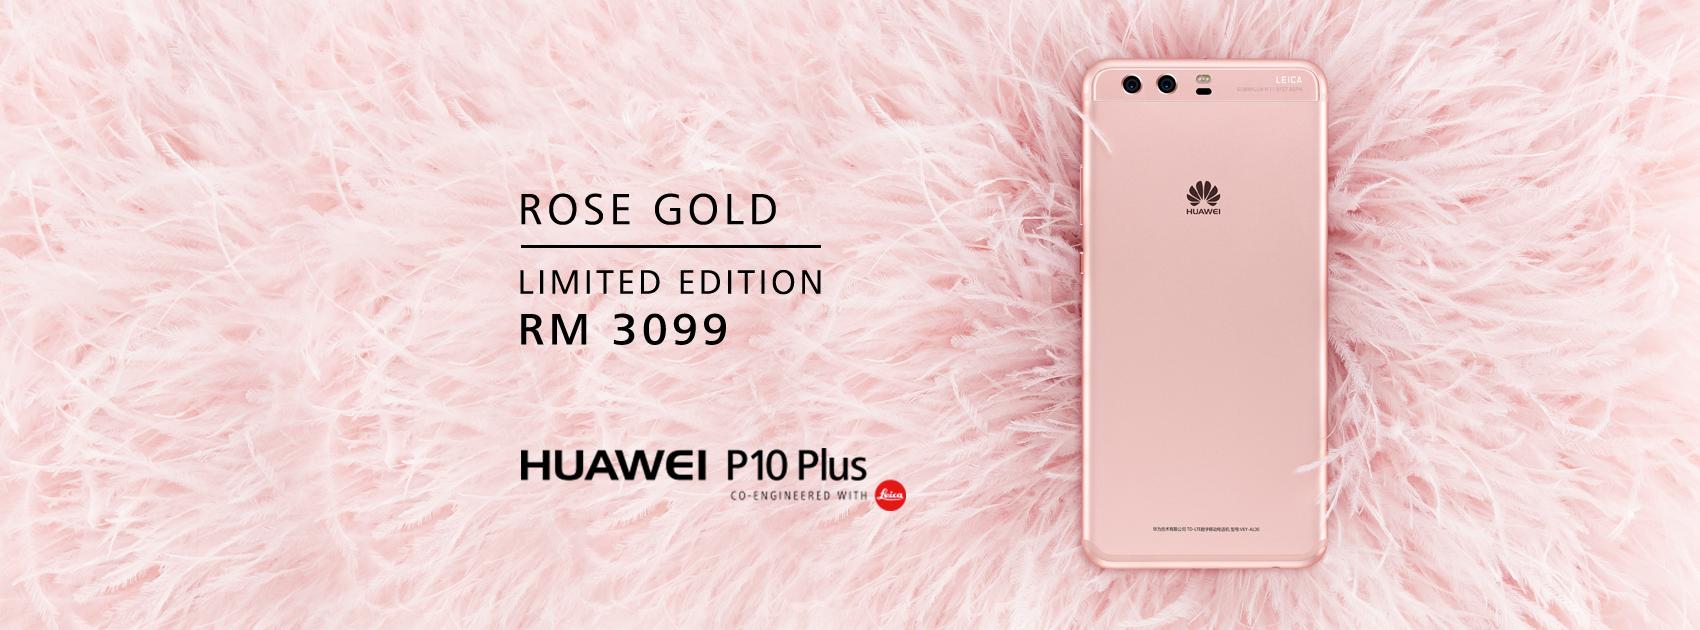 Huawei P10 Plus玫瑰金限量版今日大马正式发布!